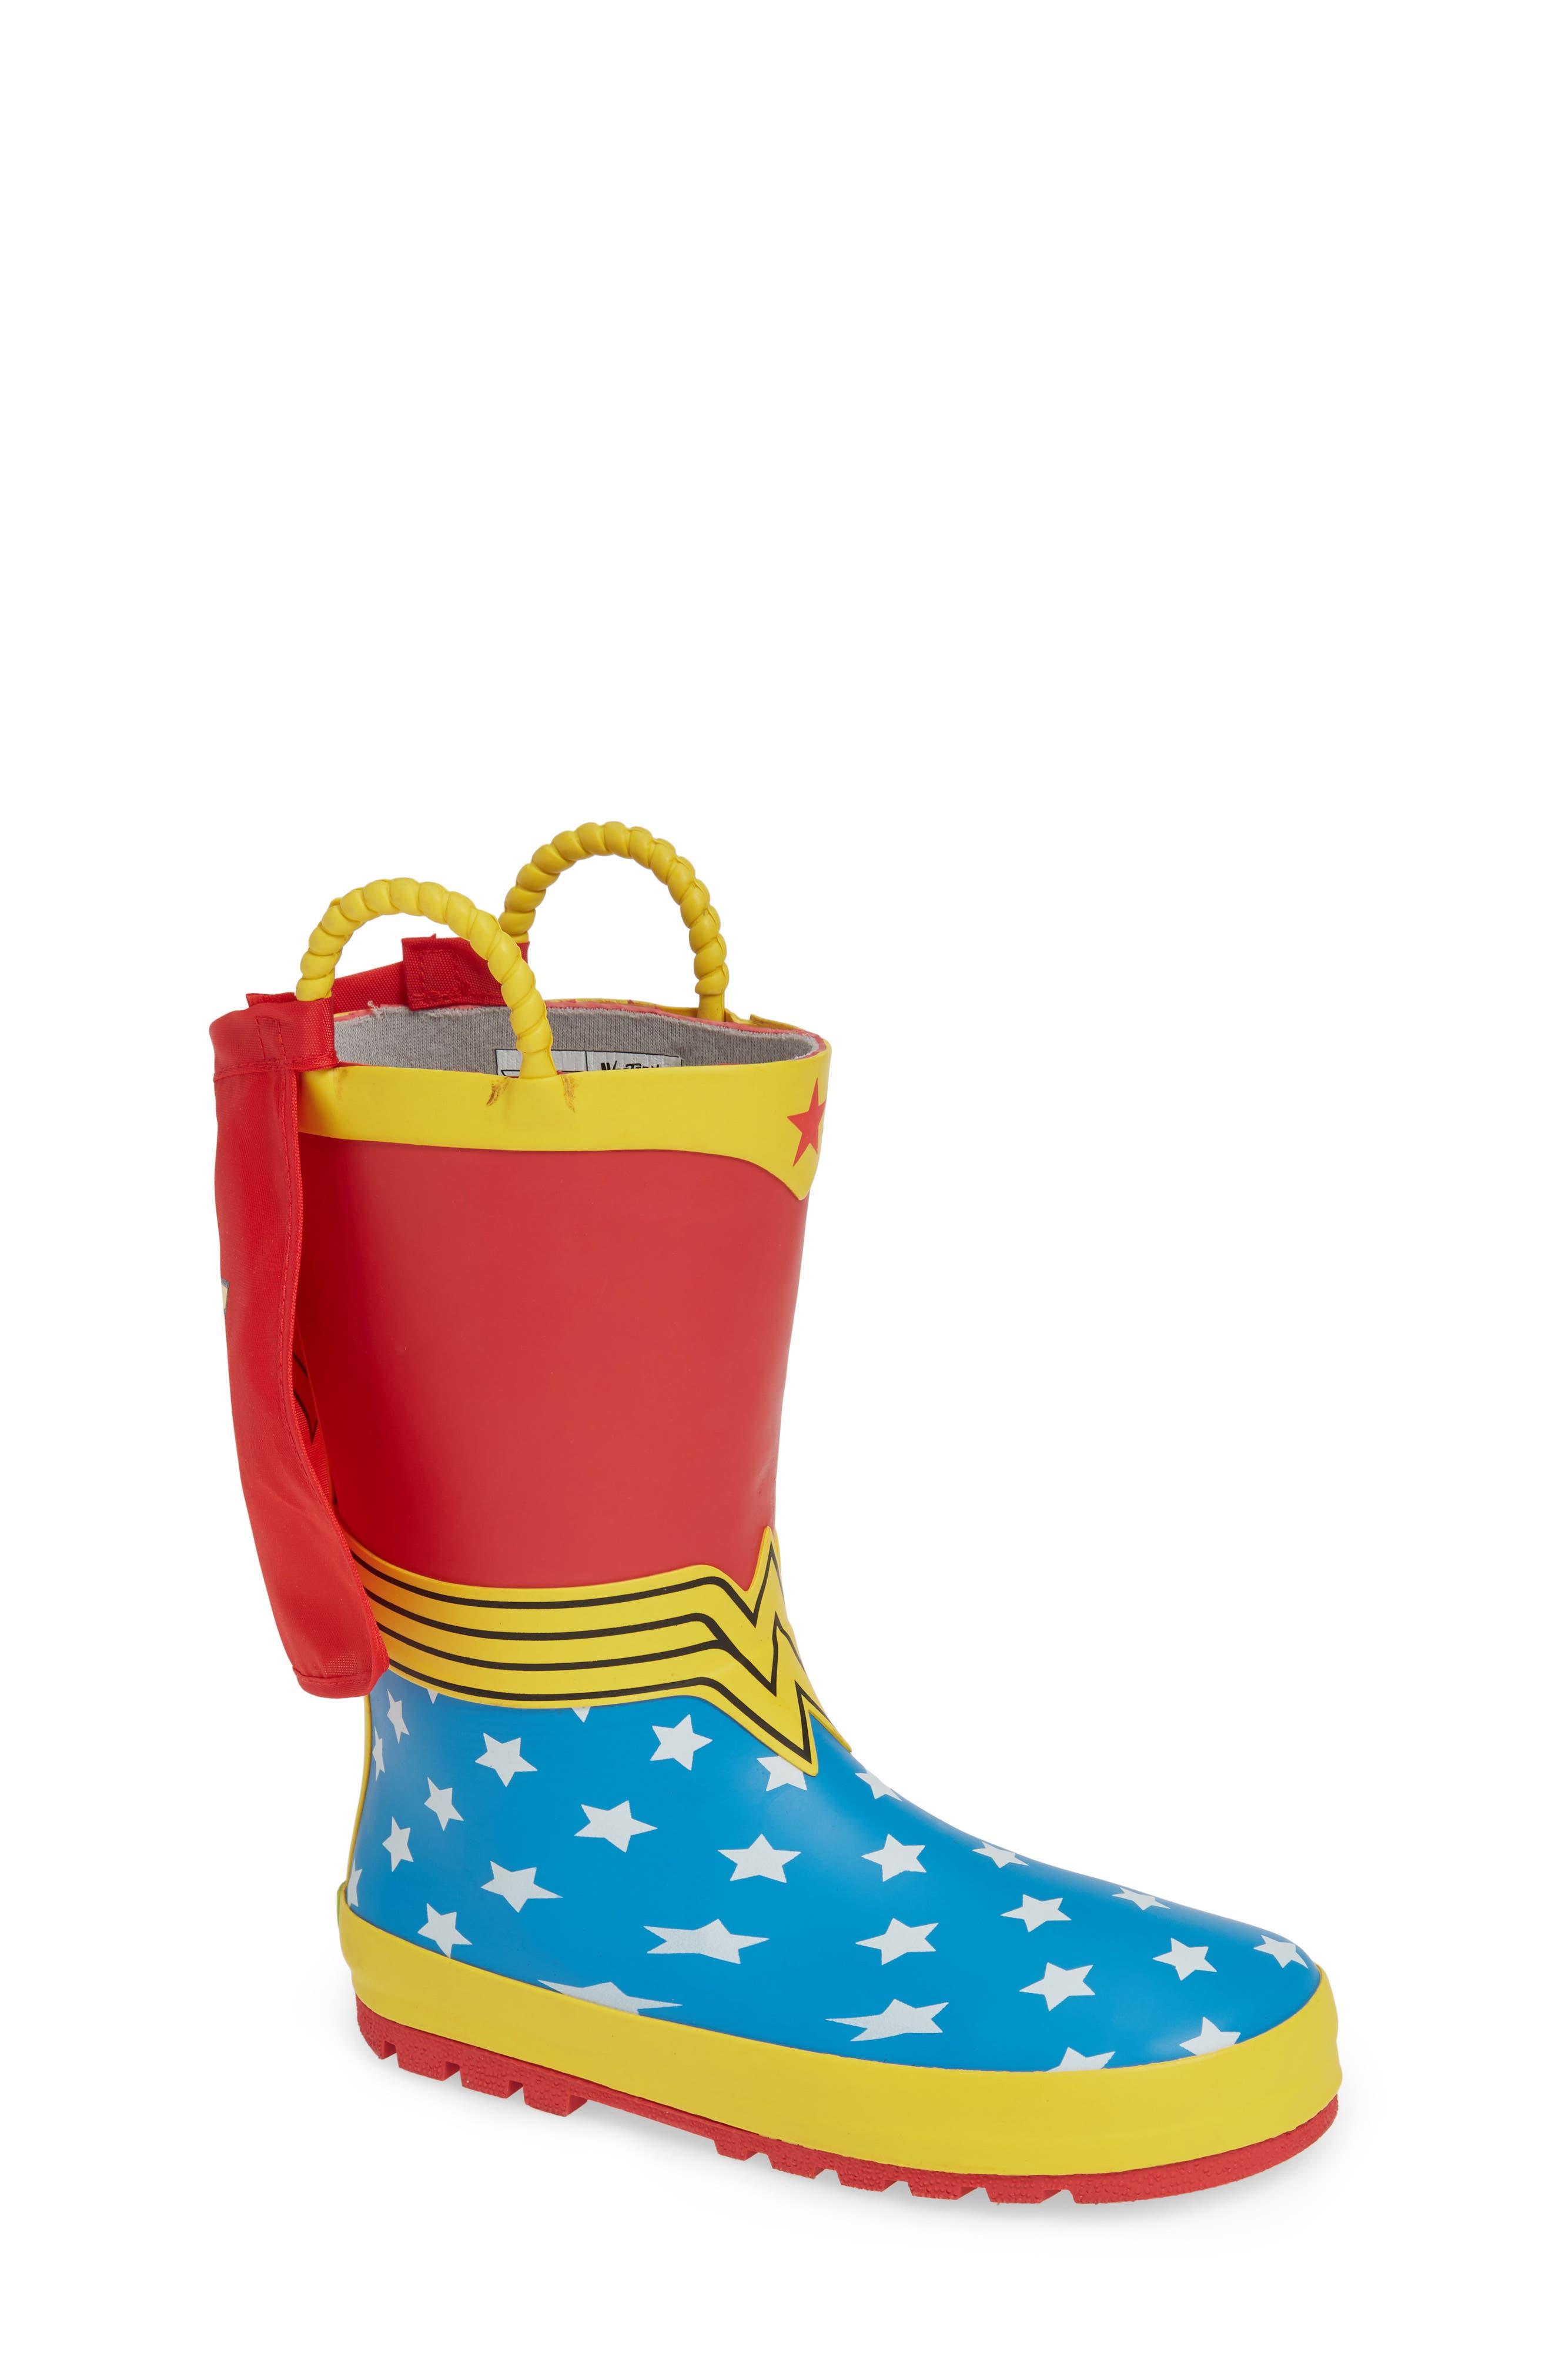 WESTERN CHIEF,                             Wonder Woman Waterproof Rain Boot,                             Main thumbnail 1, color,                             RED